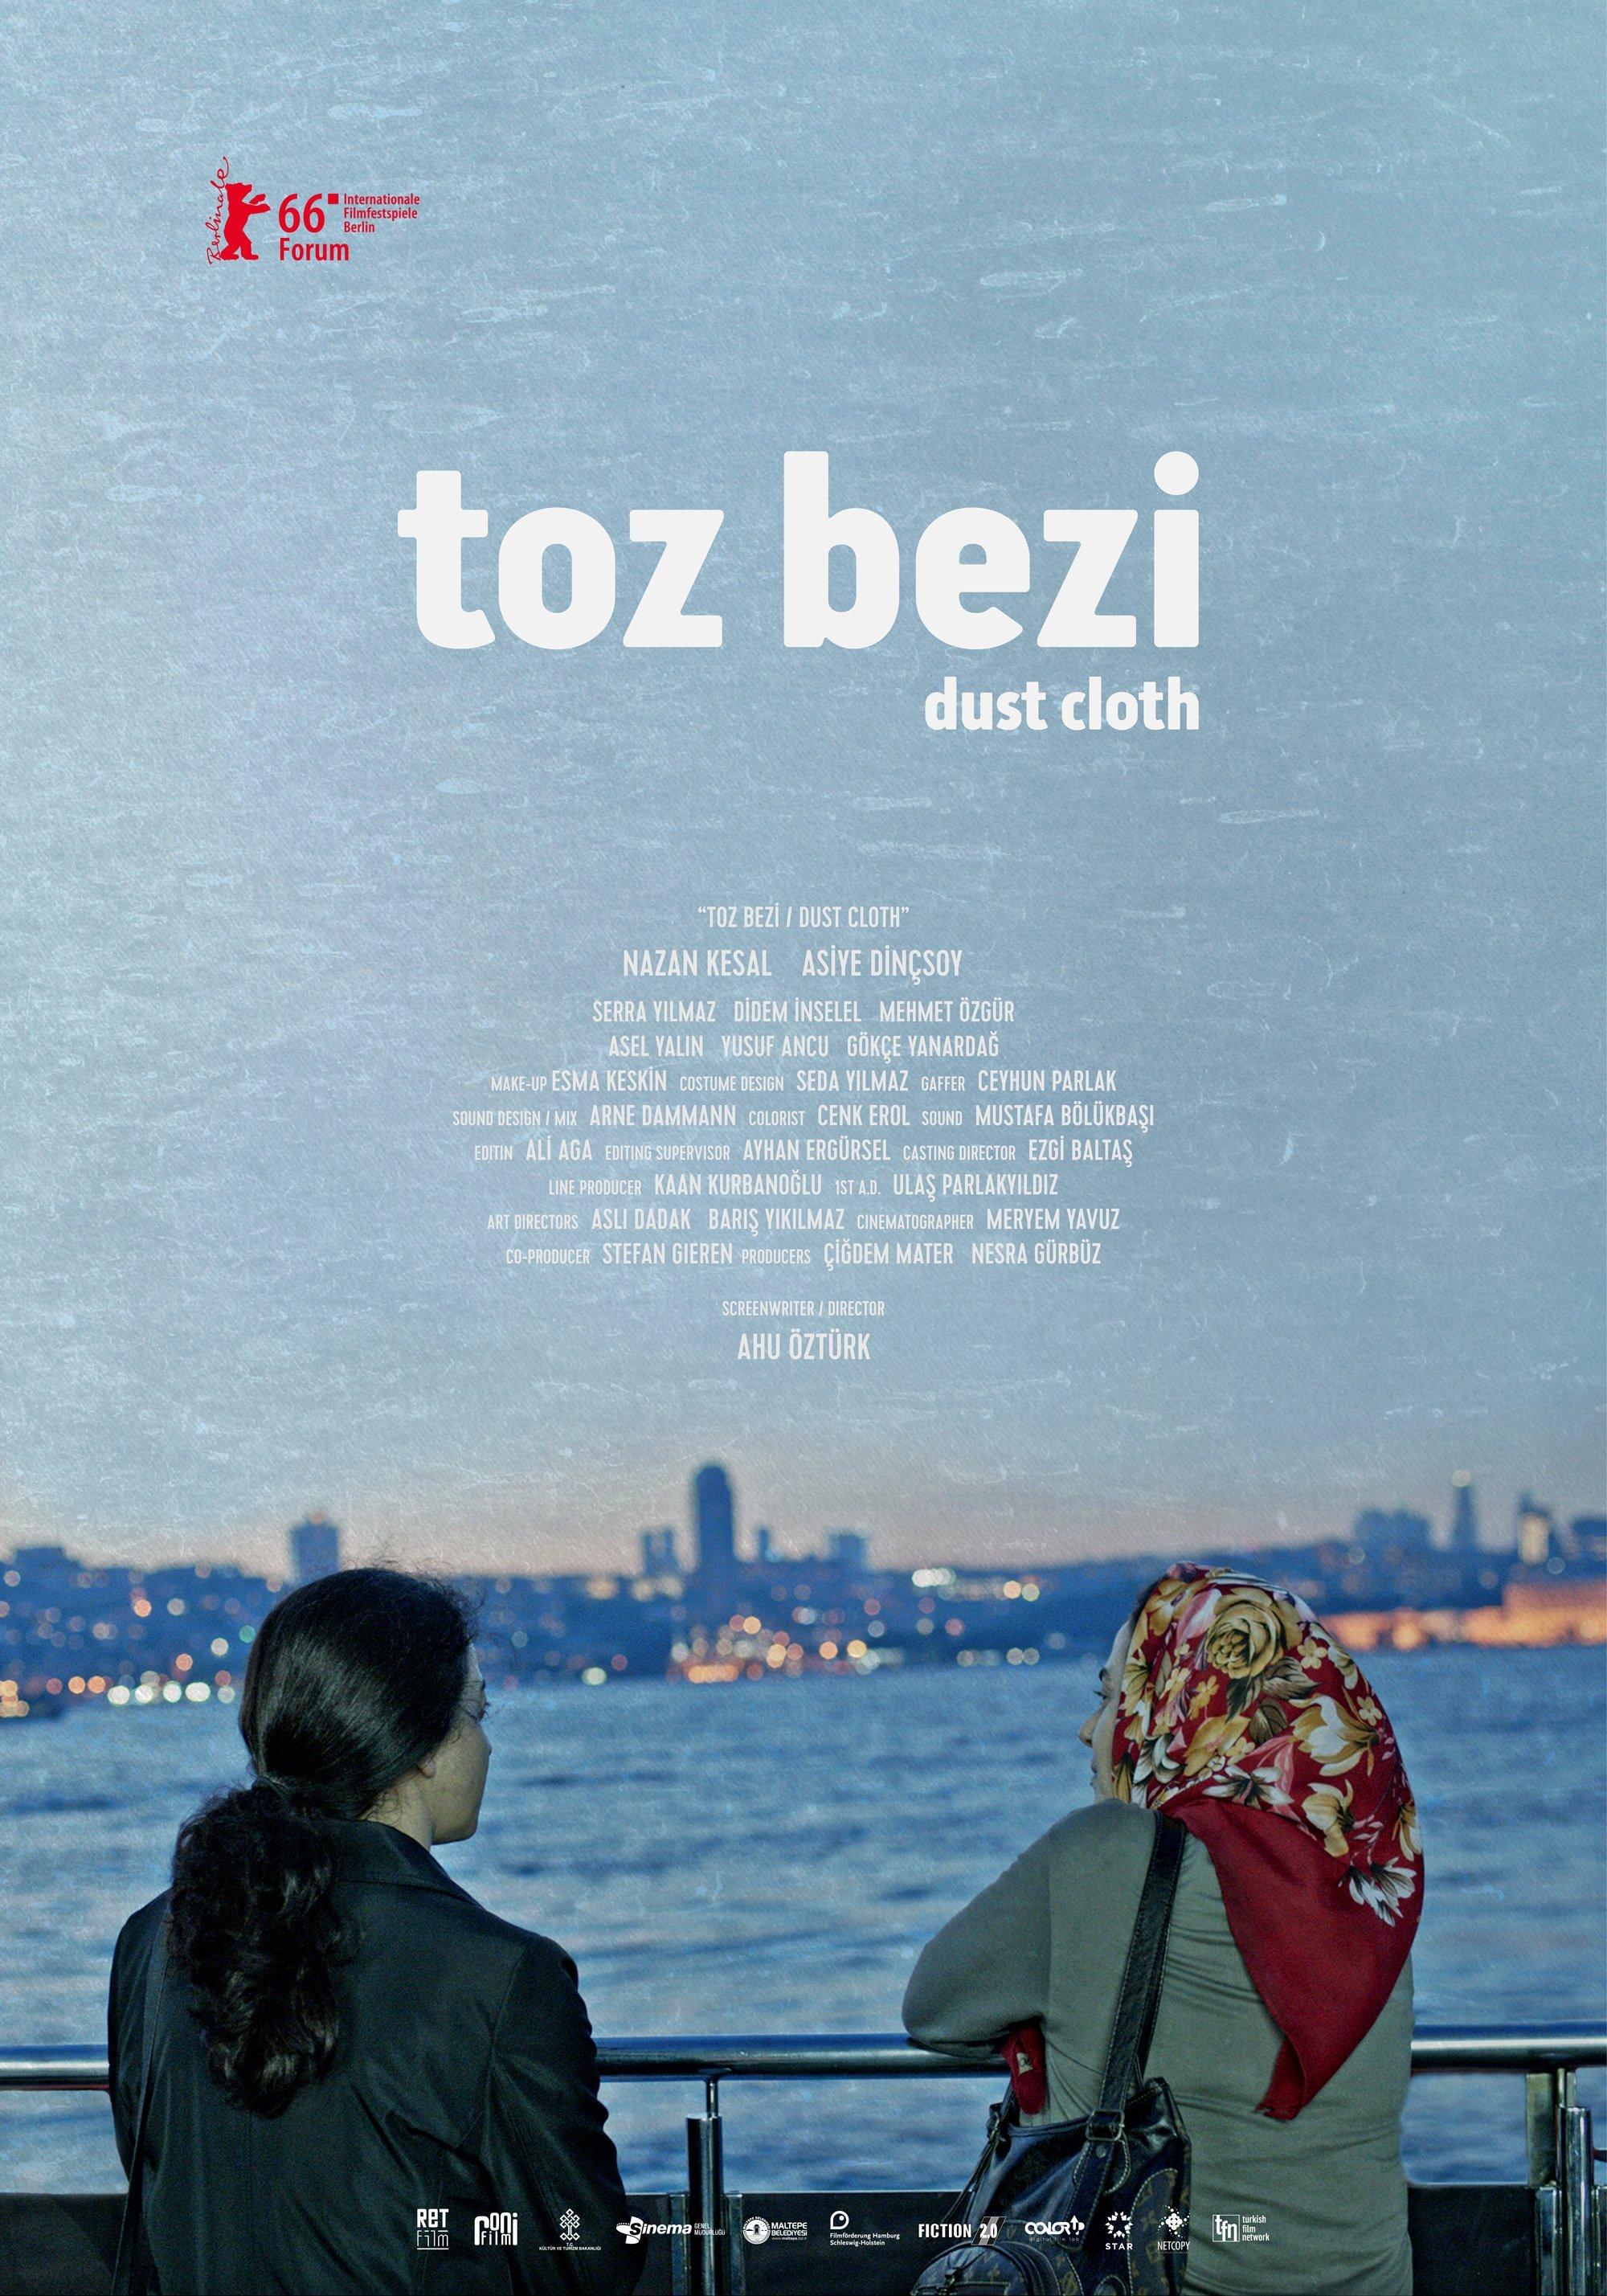 toz_beziposter